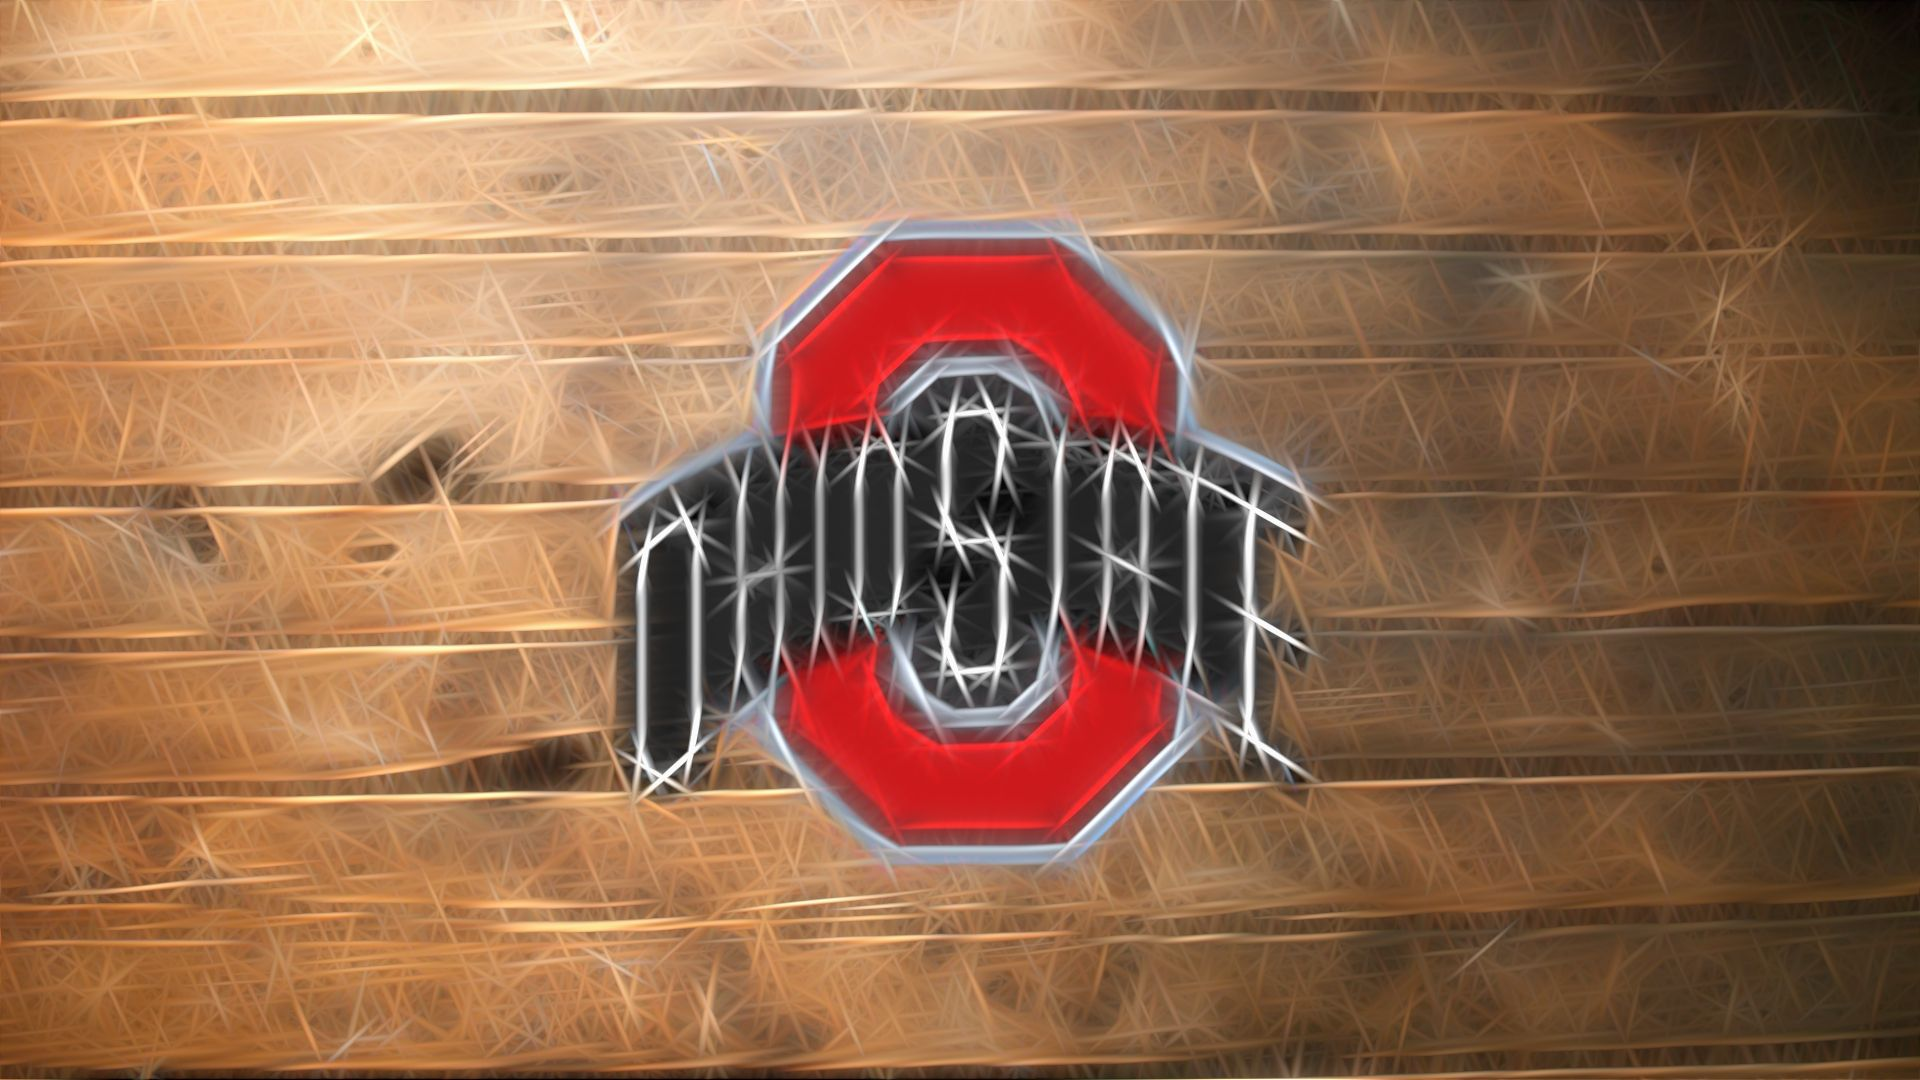 OSU Wallpaper 207 | OHIO STATE DESKTOP WALLPAPERS | Pinterest